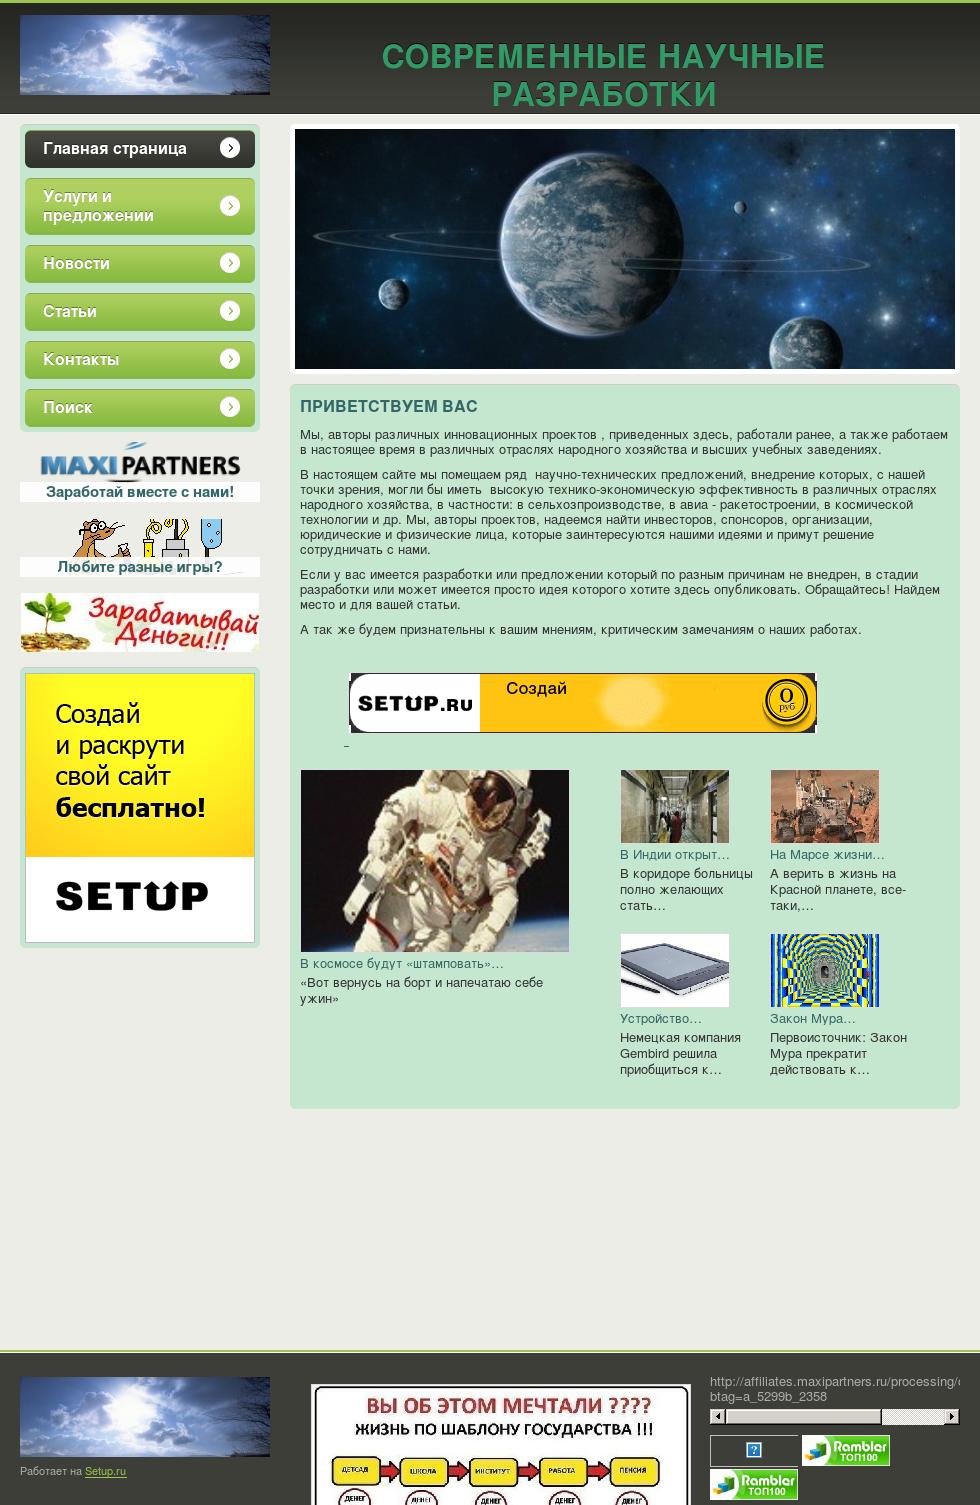 researchproject.ru